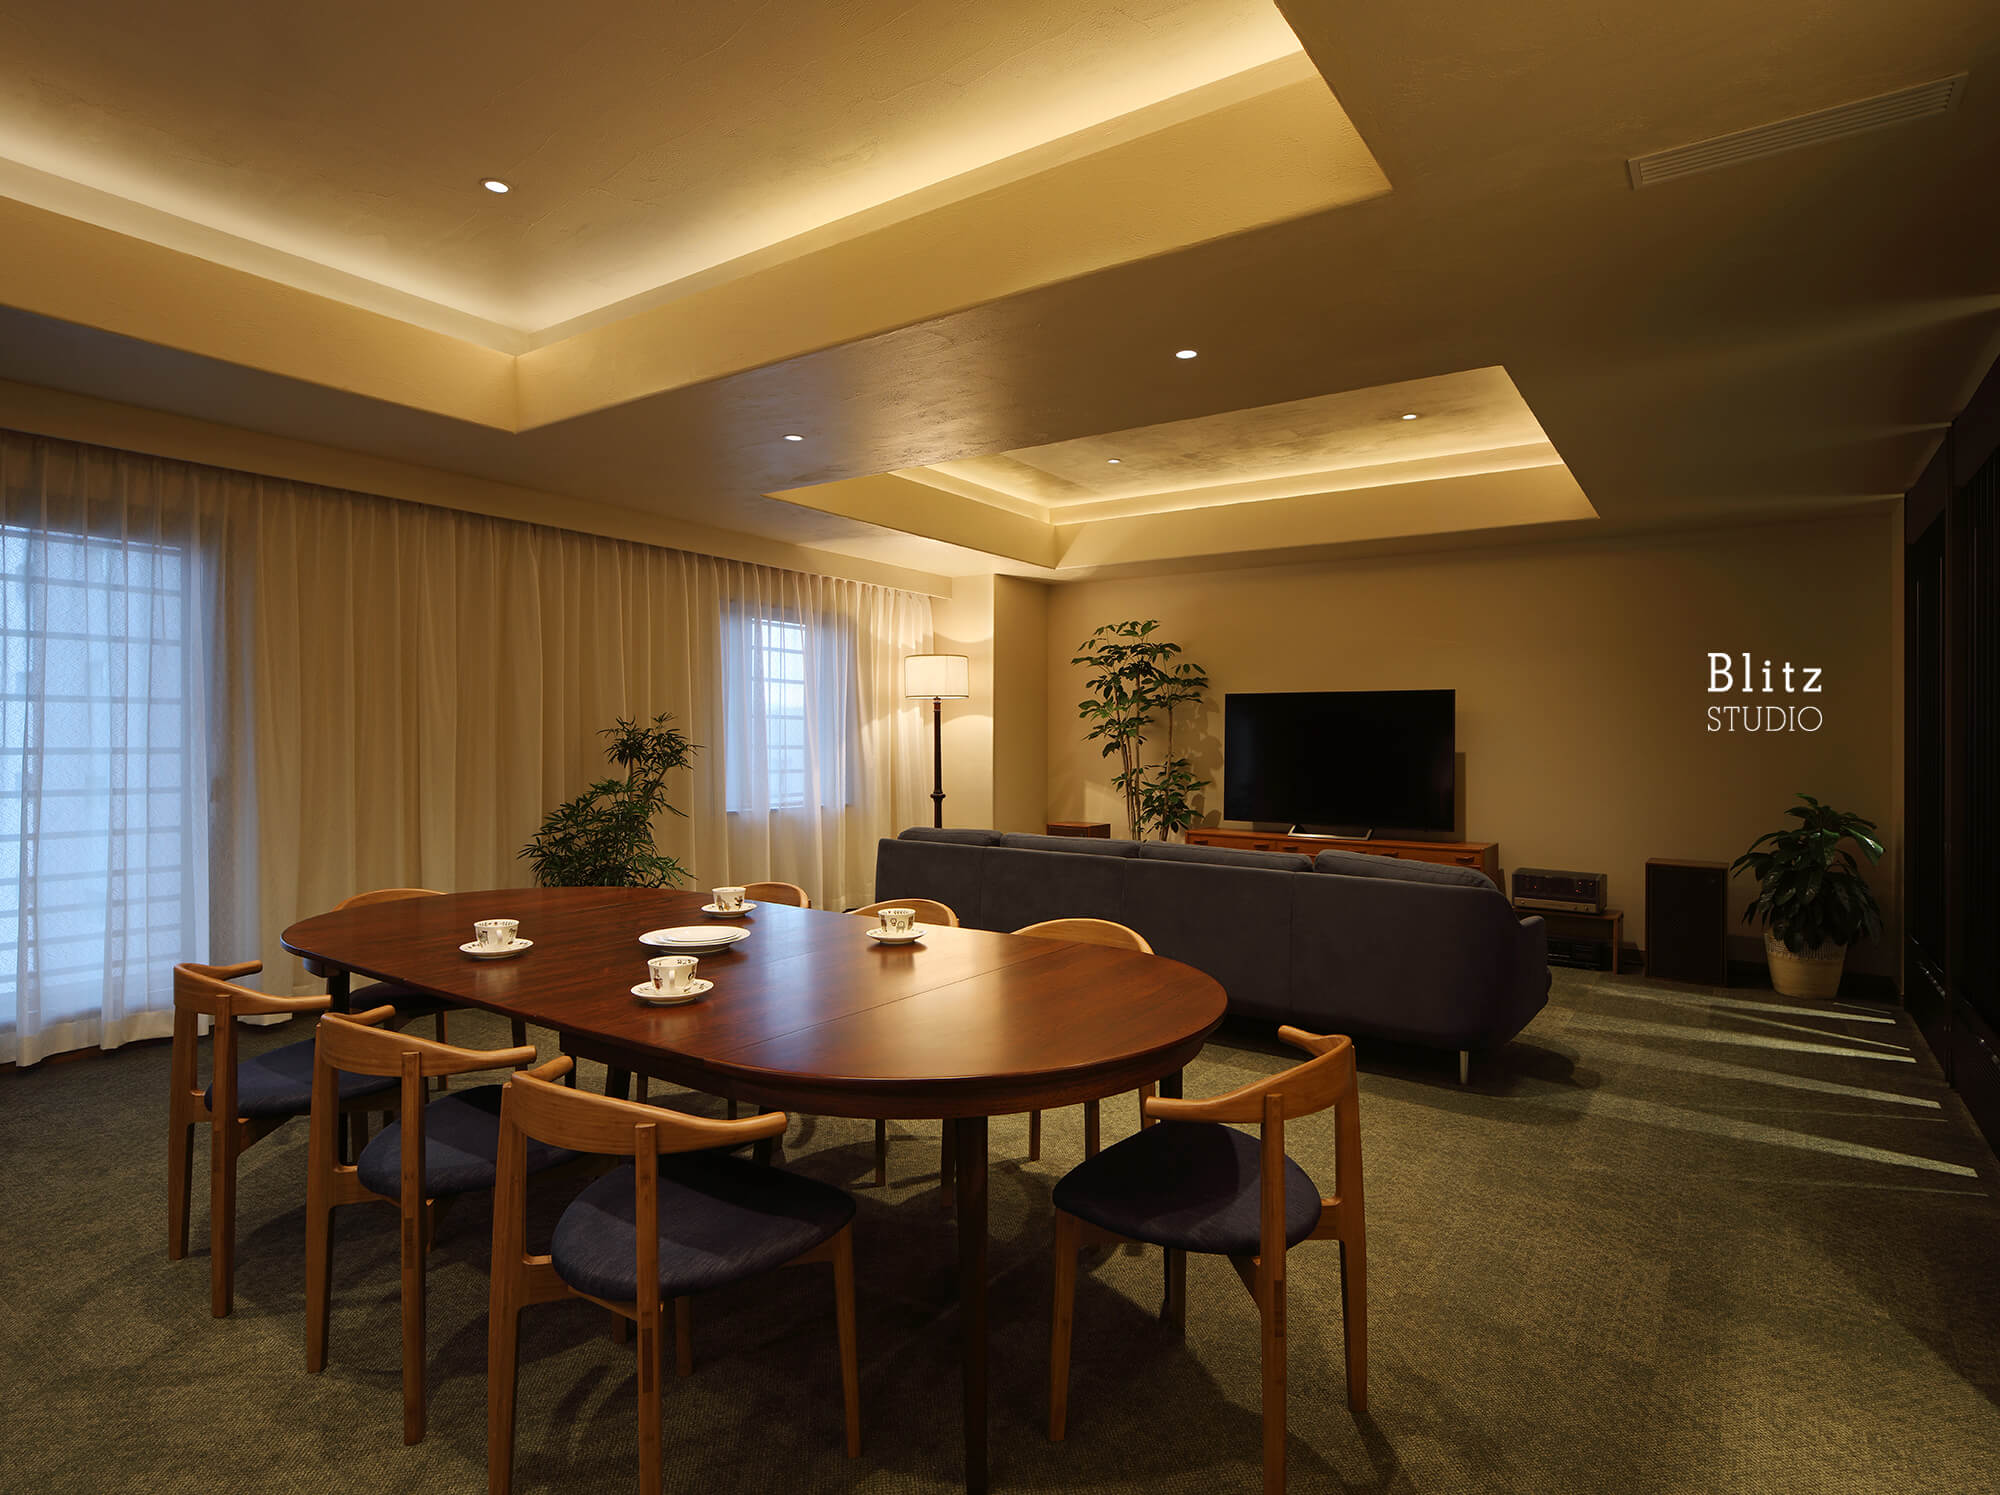 『HOTEL GREAT MORNING』建築写真・竣工写真・インテリア写真22